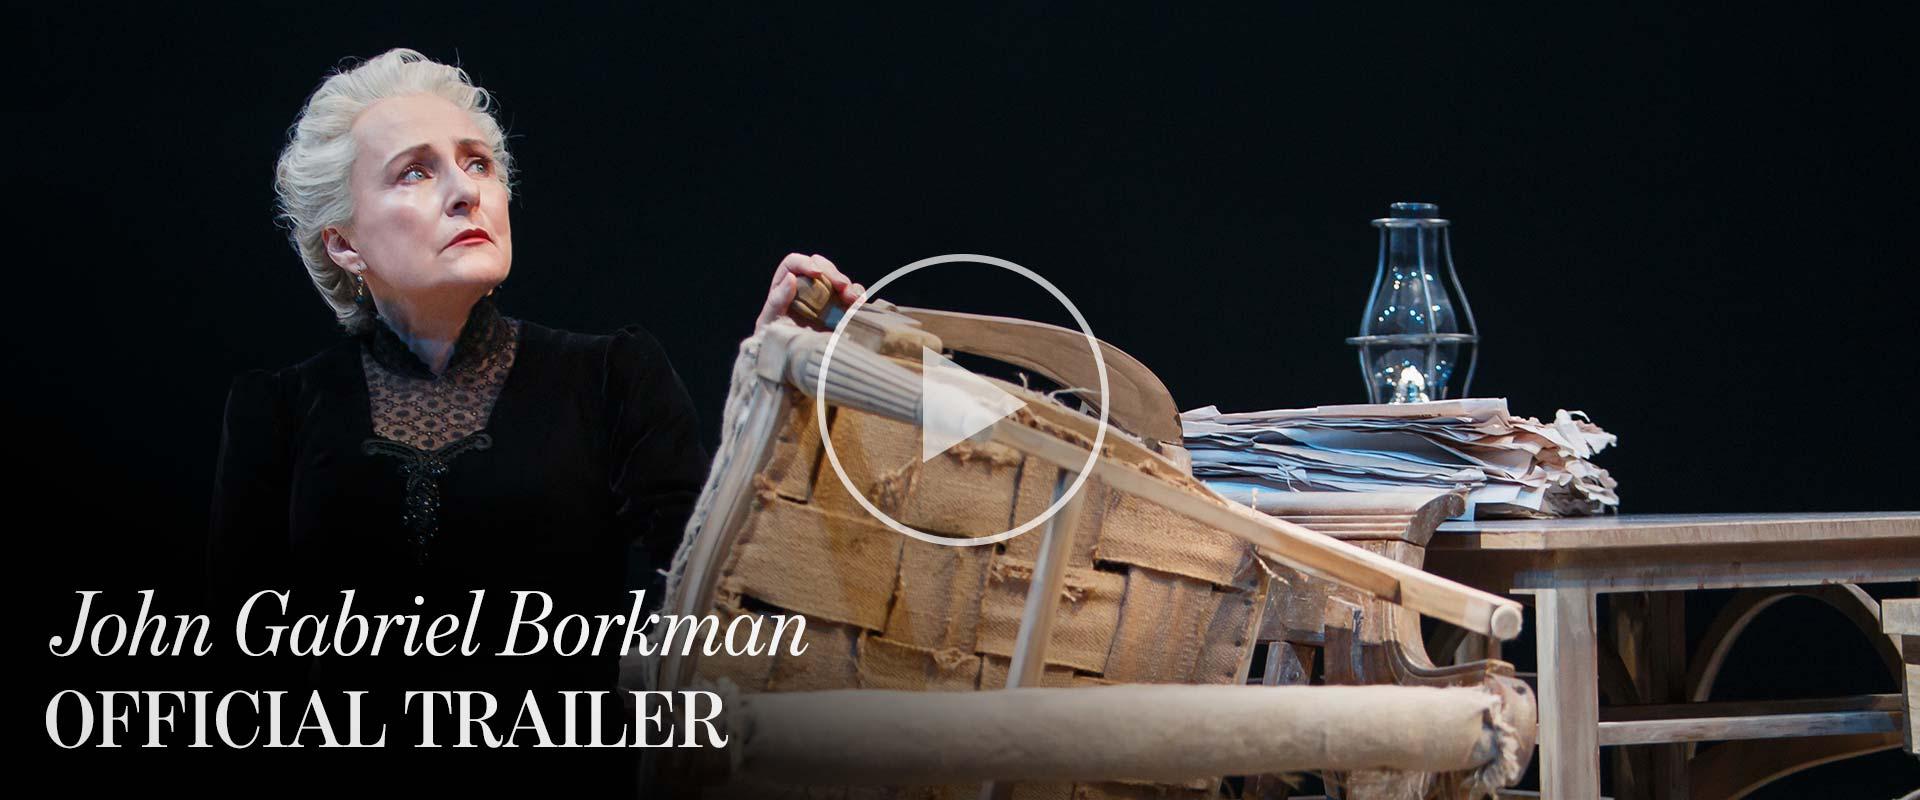 John Gabriel Borkman Official Trailer